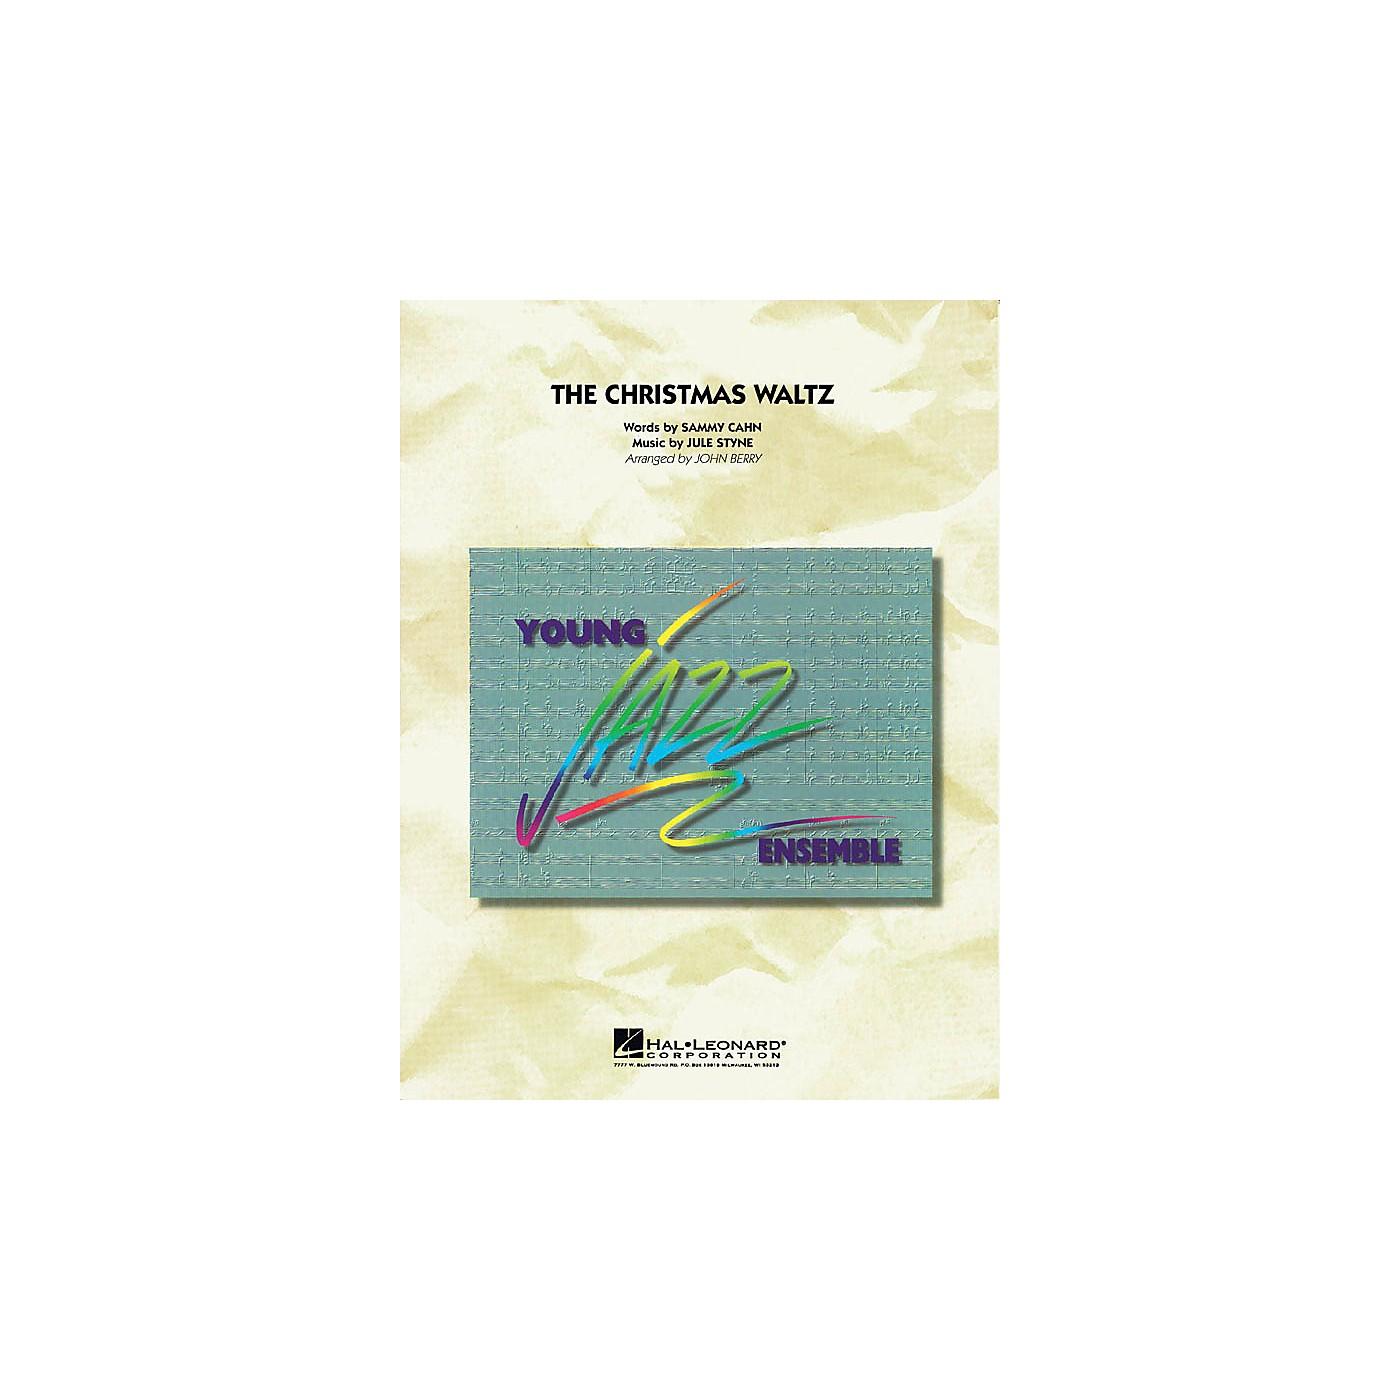 Hal Leonard The Christmas Waltz Jazz Band Level 3 Arranged by John Berry thumbnail